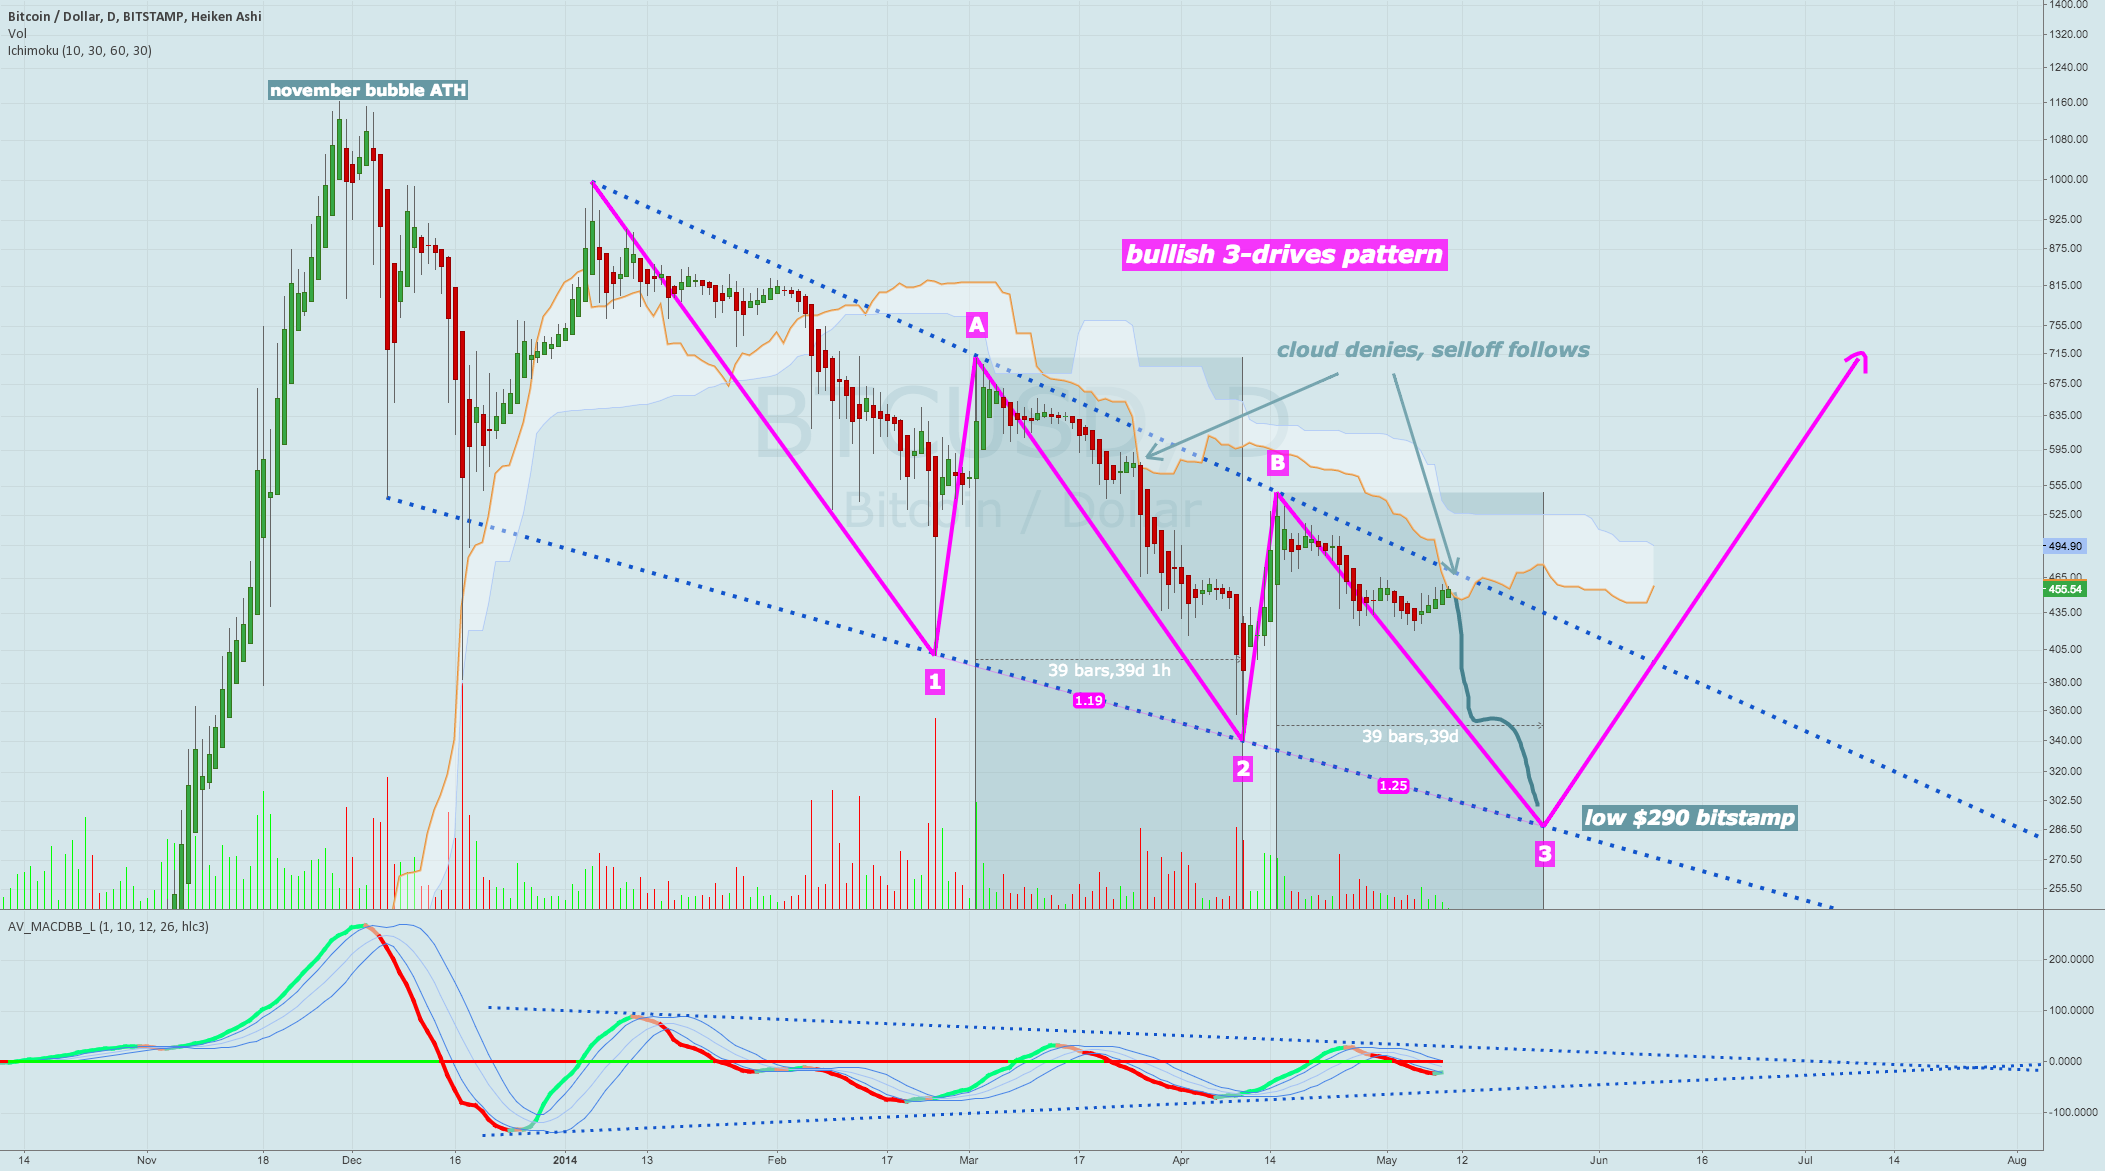 Entire bubble correction since Jan. descends in 3-drives pattern